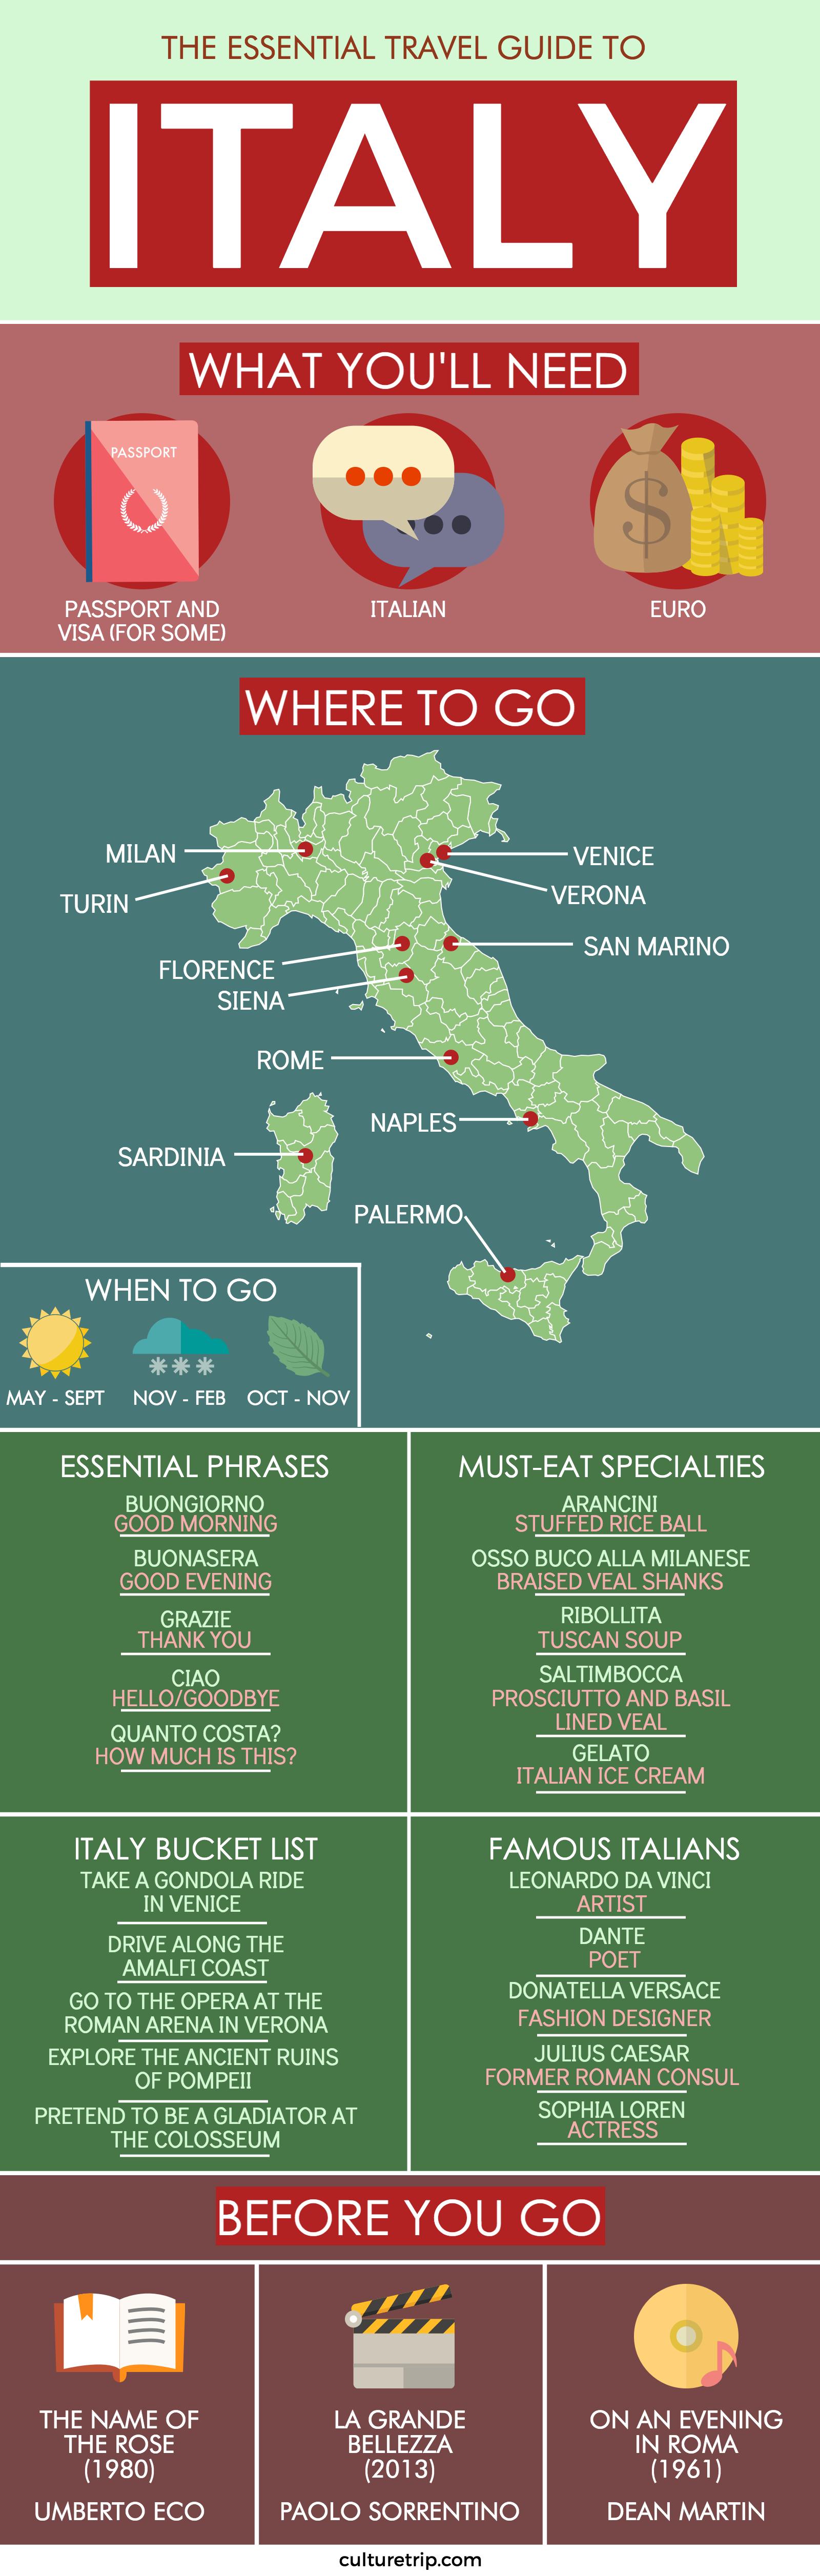 Nappy Travel Tips Italy #travellers #TravelDestinationsTumblr #traveltexas